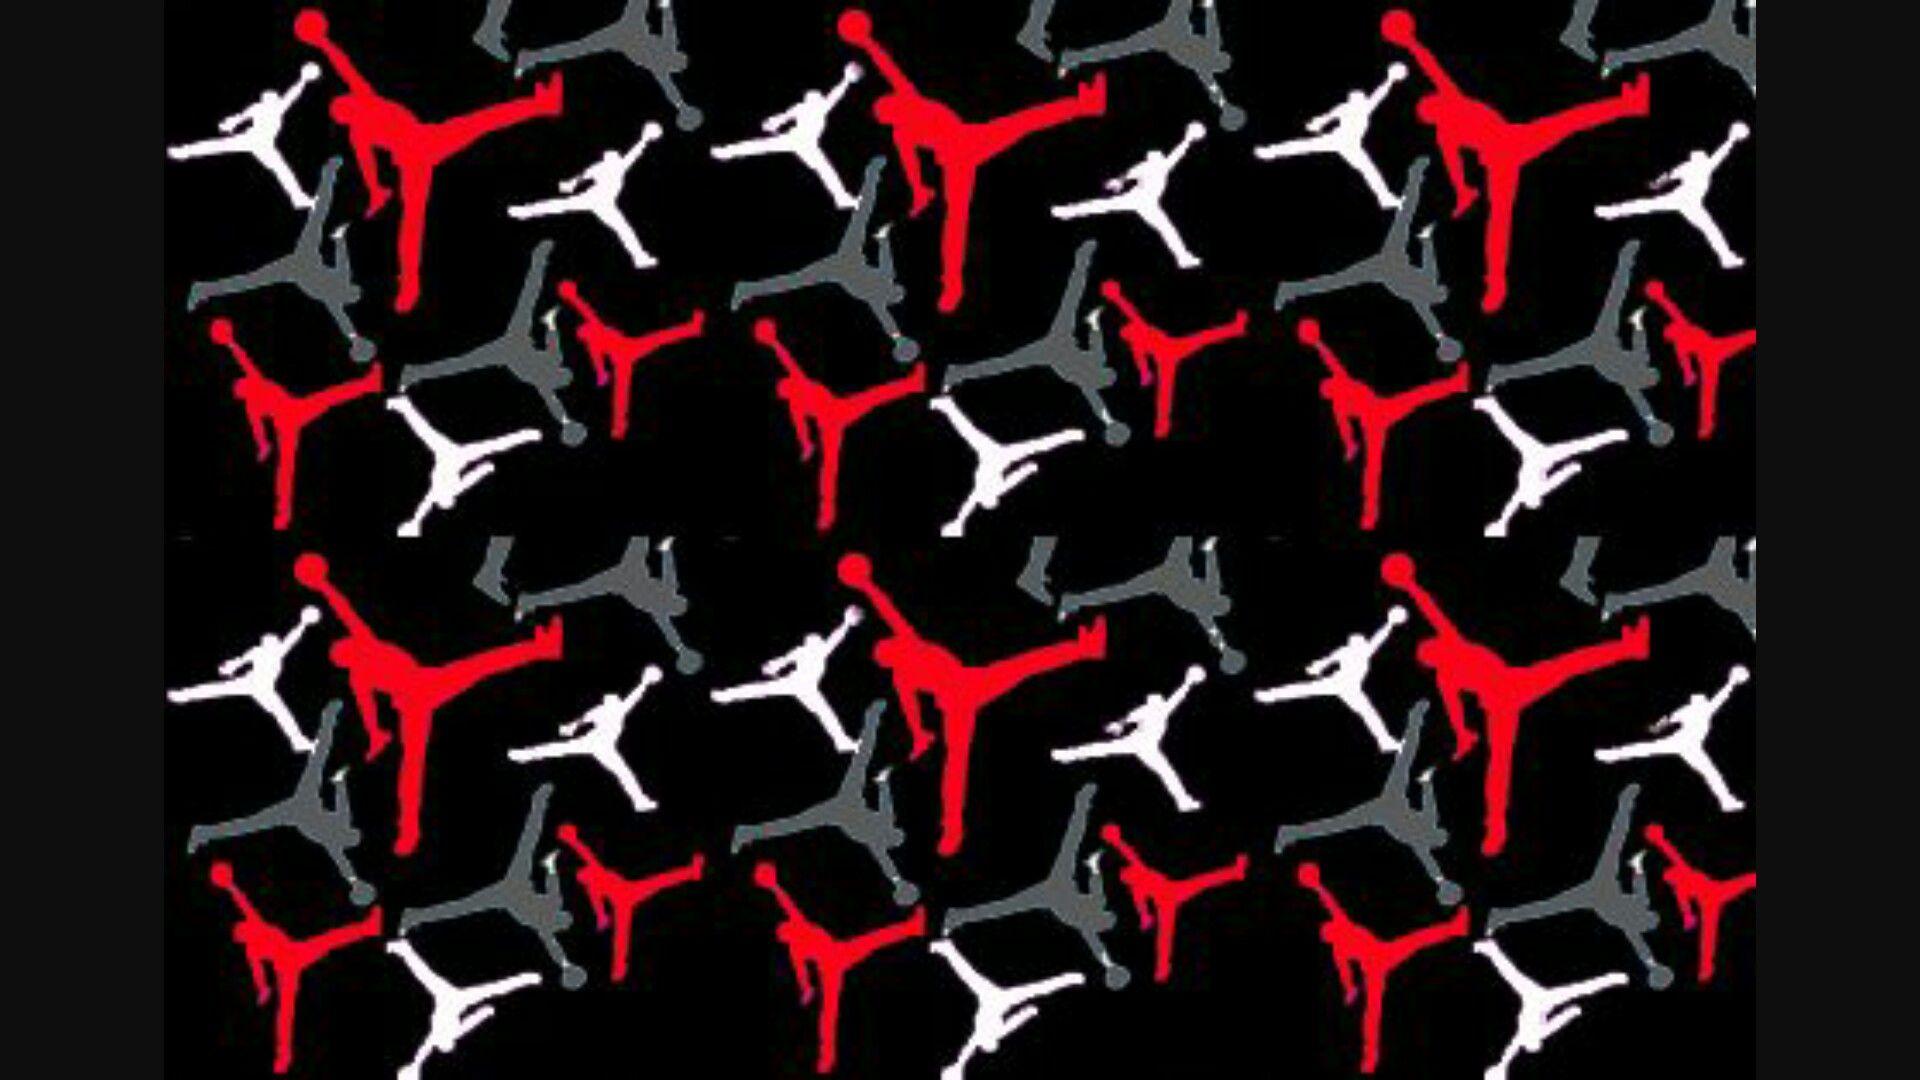 Pin by Aiden Mendenhall on sports Jordan logo wallpaper